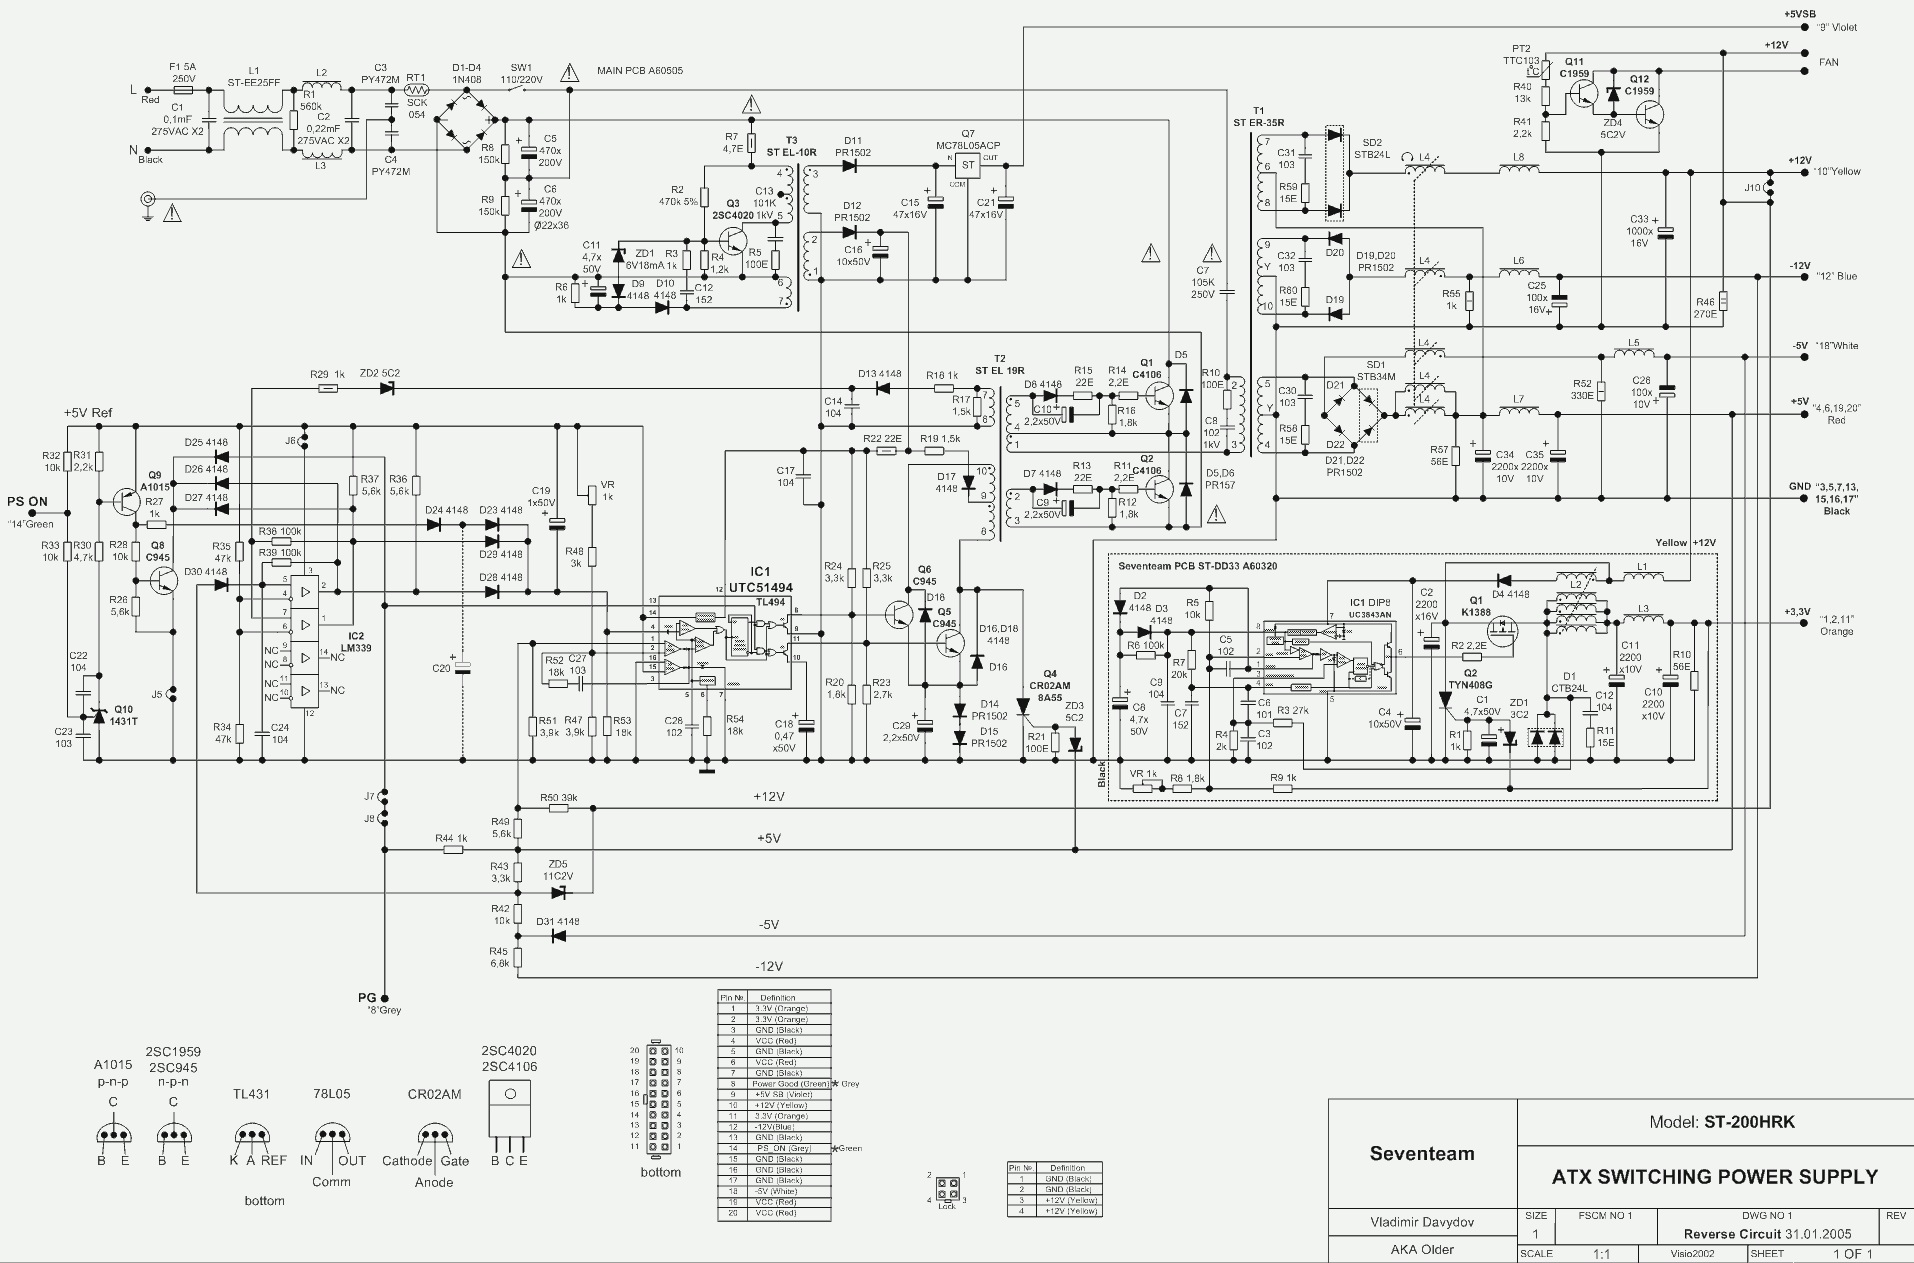 200x Wiring Diagram At And Atx Pc Computer Supplies Schematics